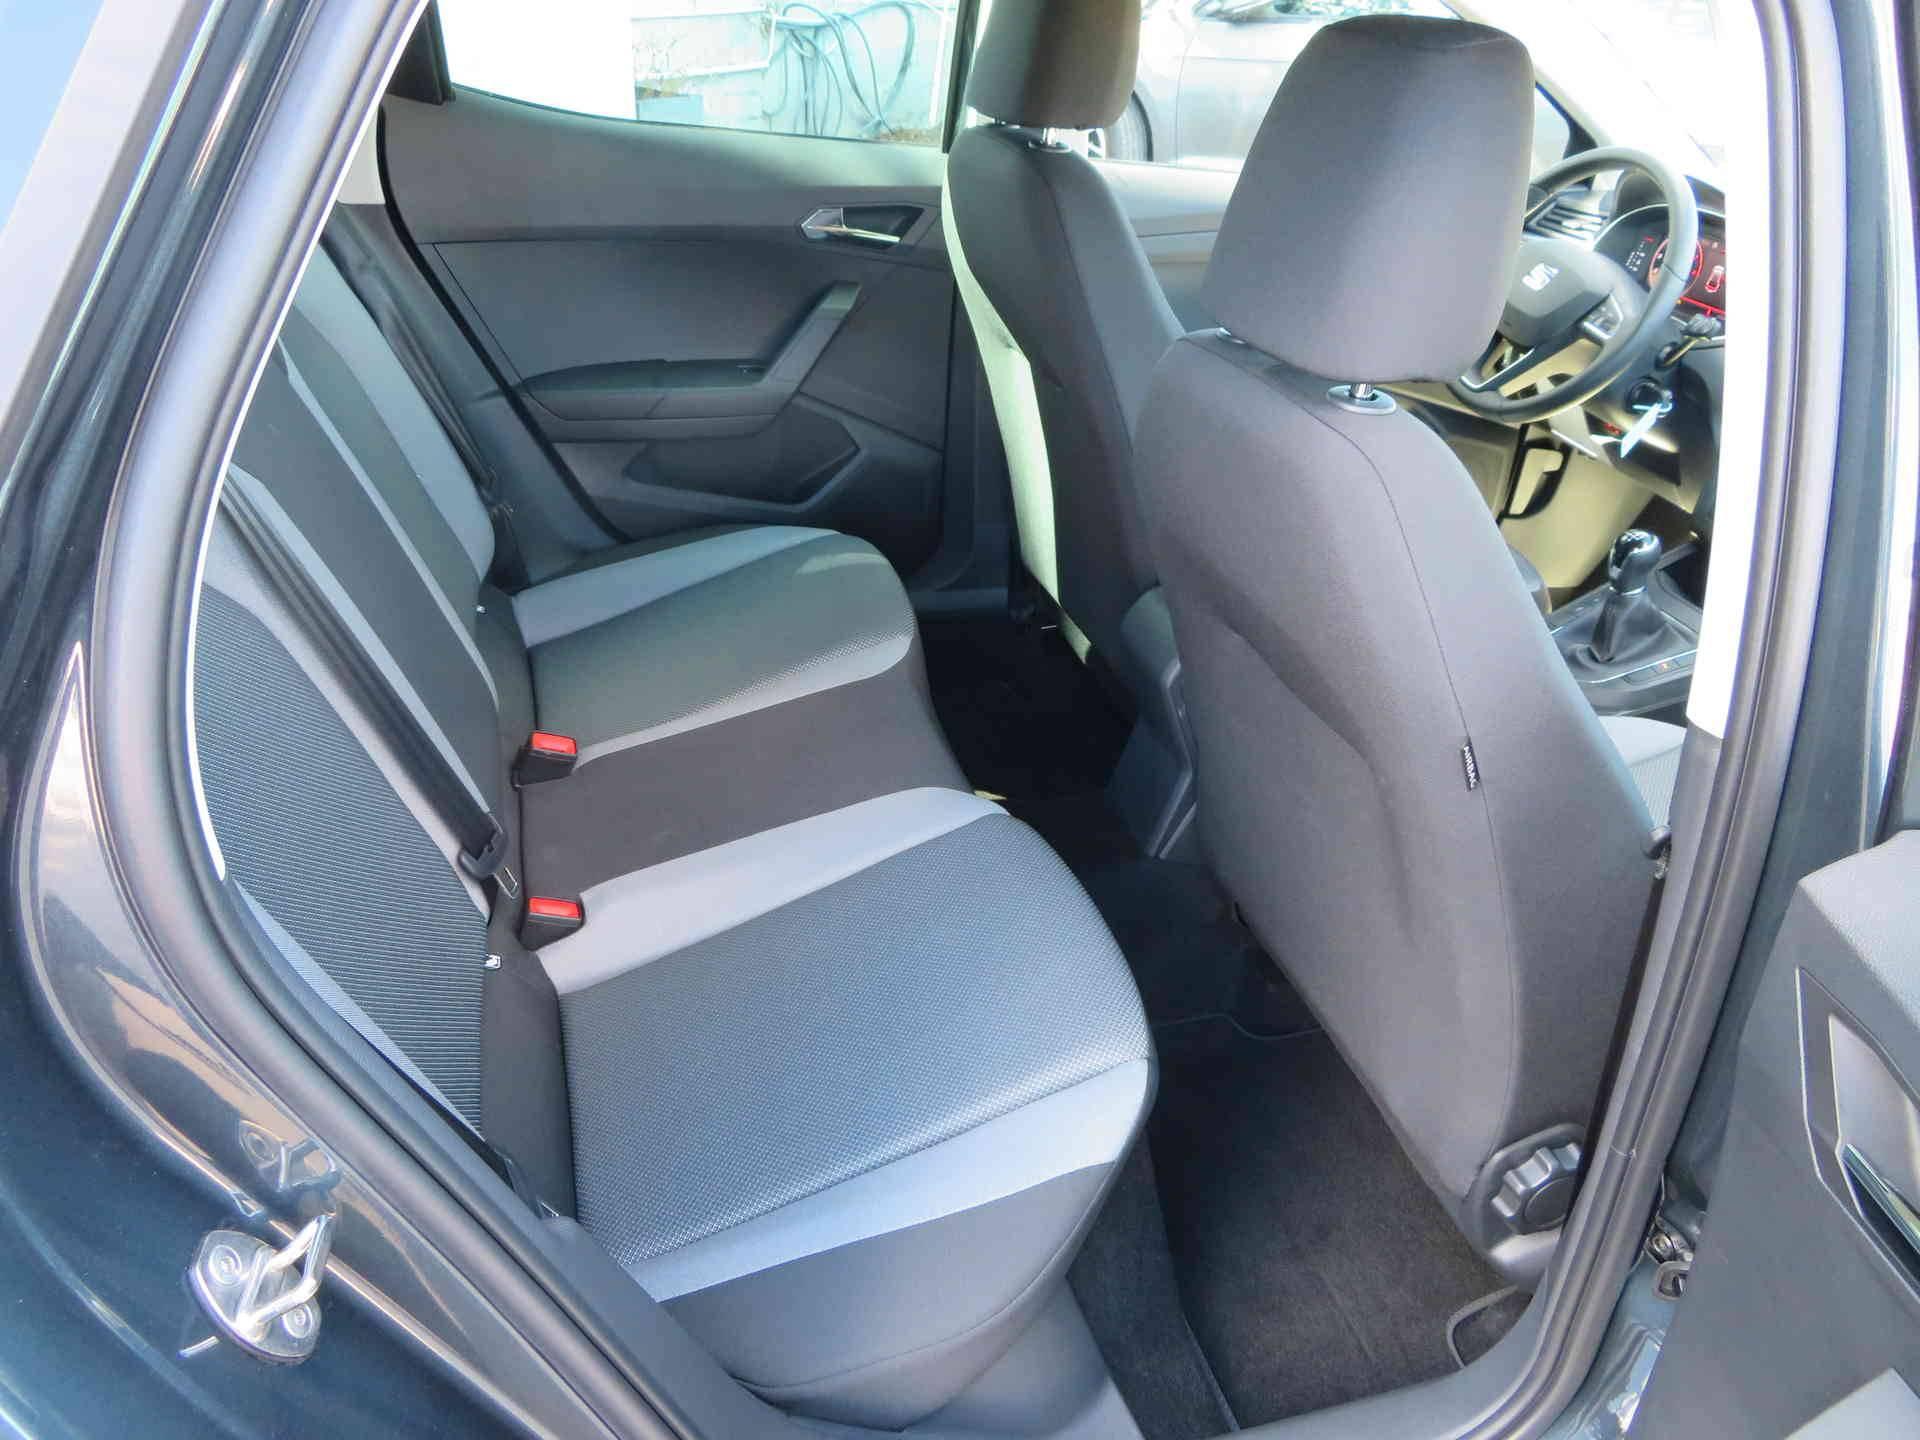 4 - Ibiza 1.6 TDI 95 ch S/S BVM5